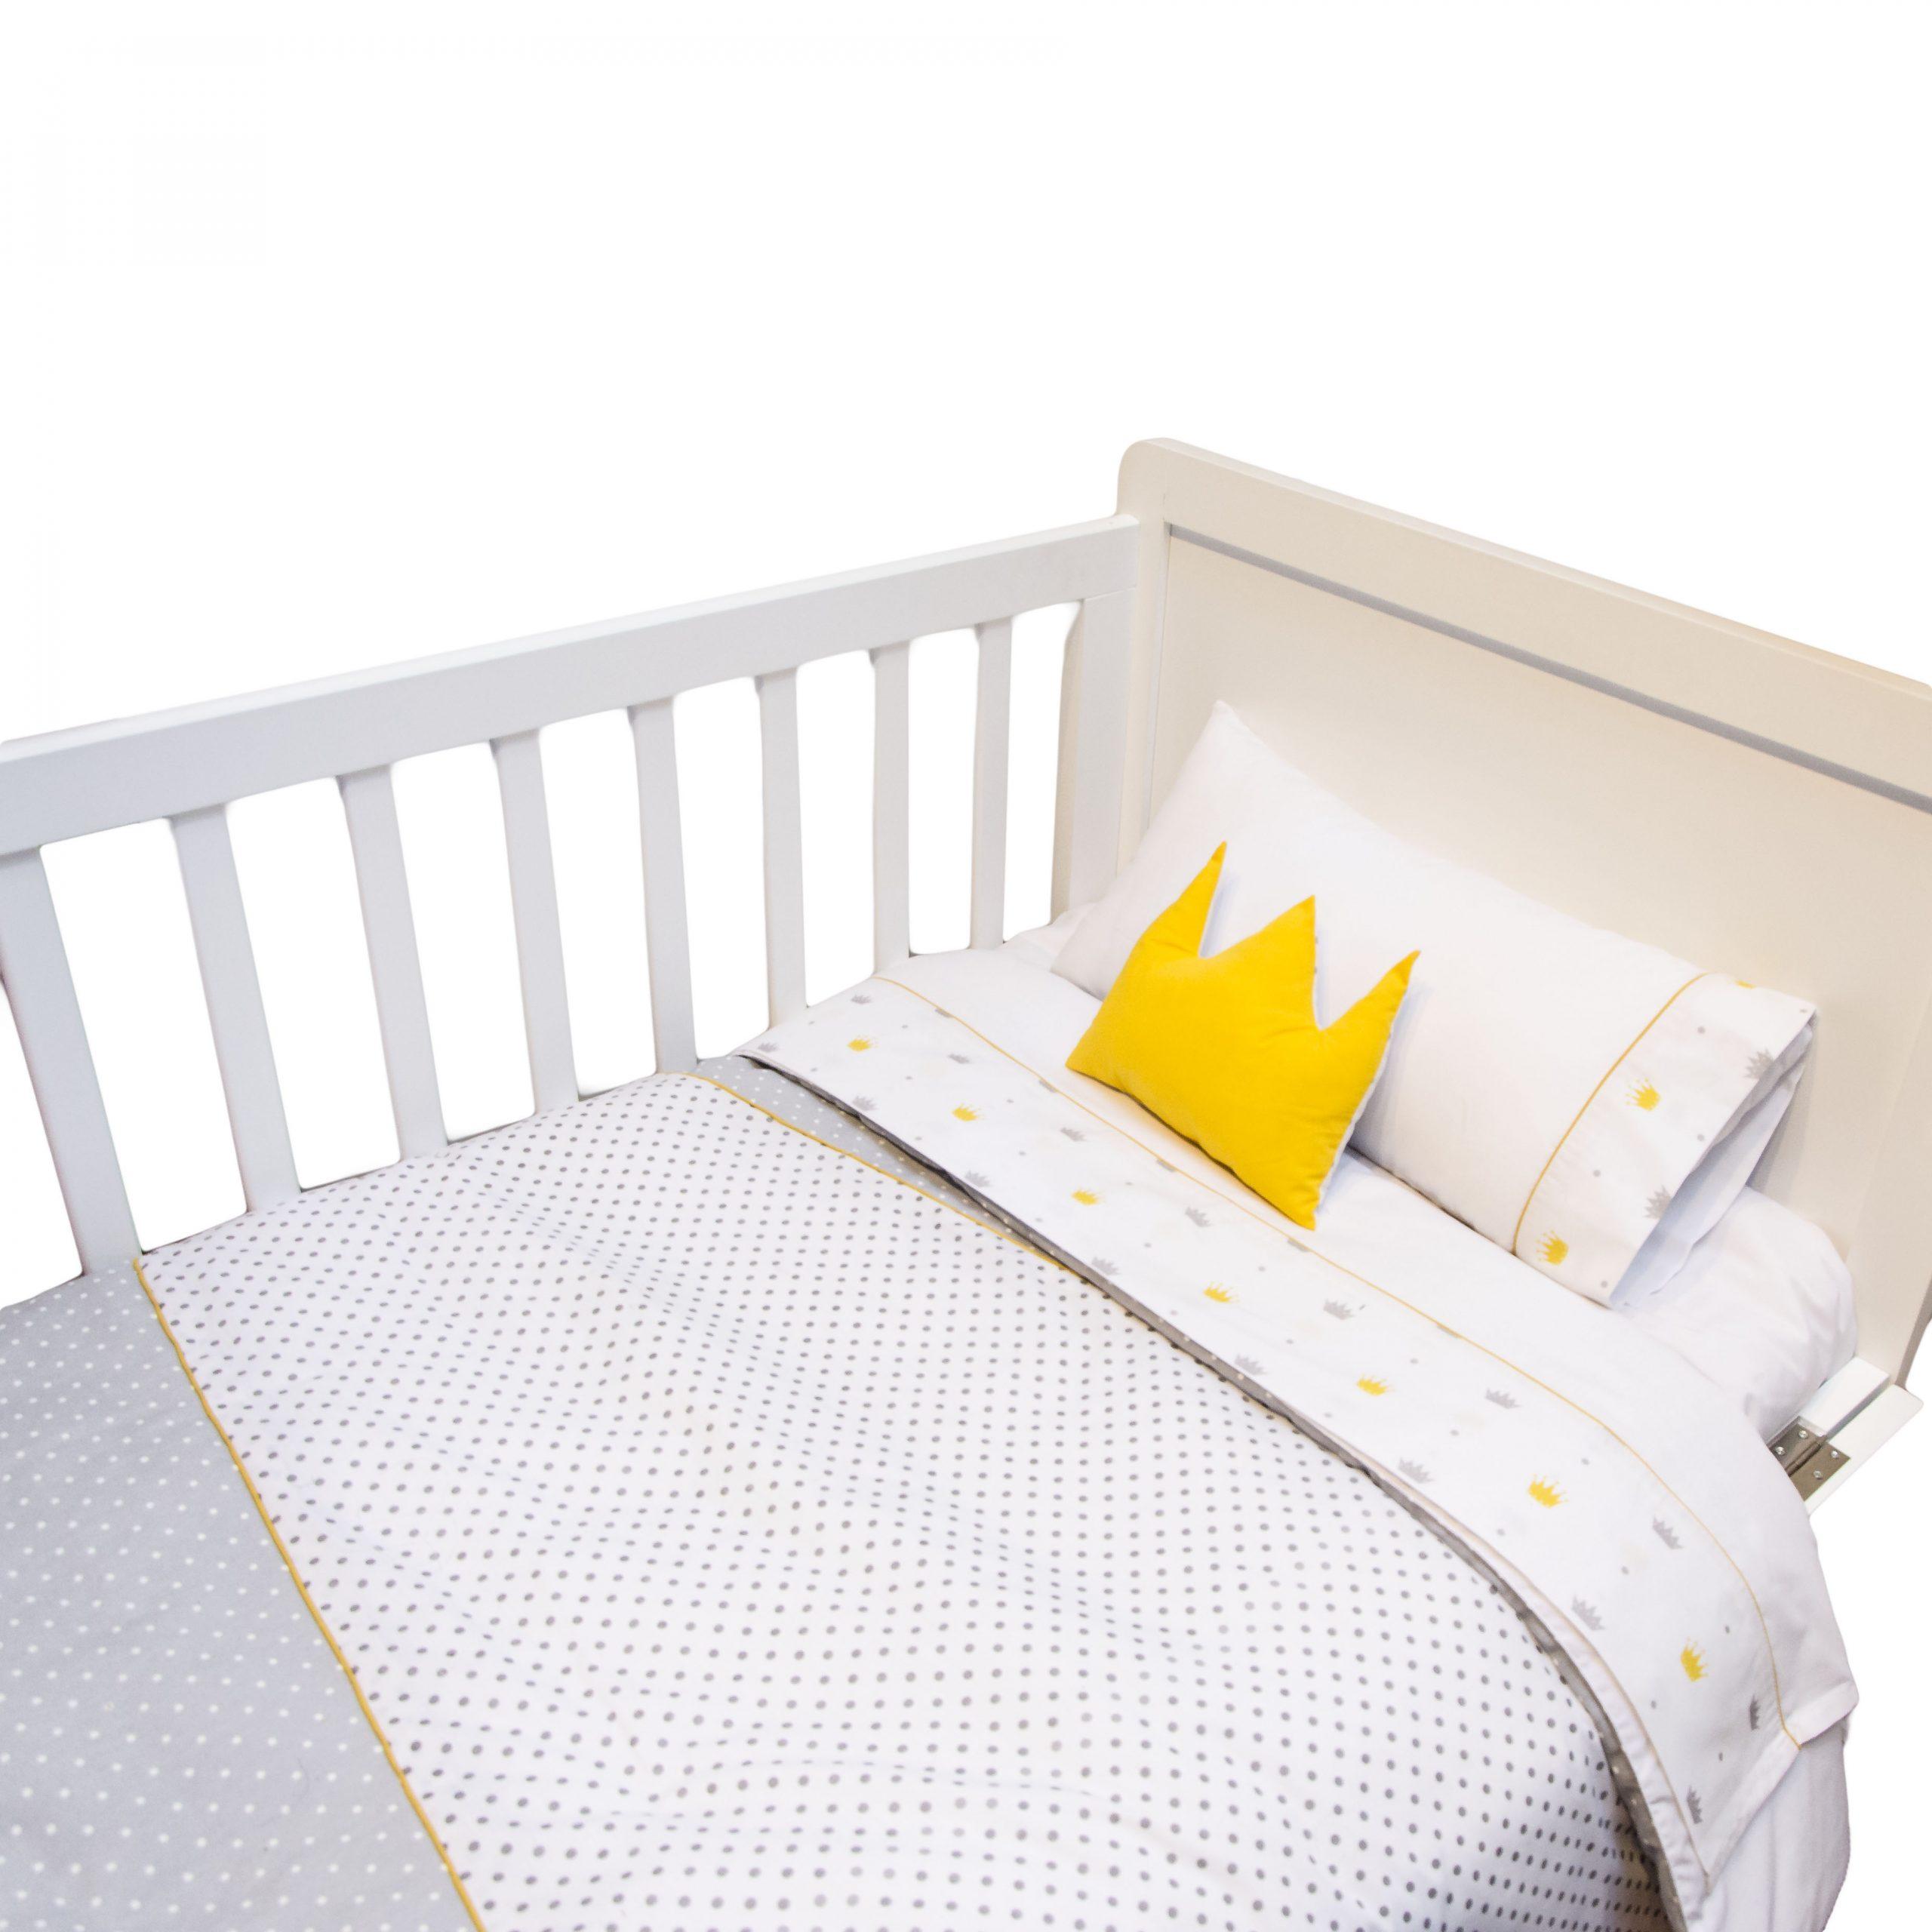 cobertor Bebe rey _ 01.jpg